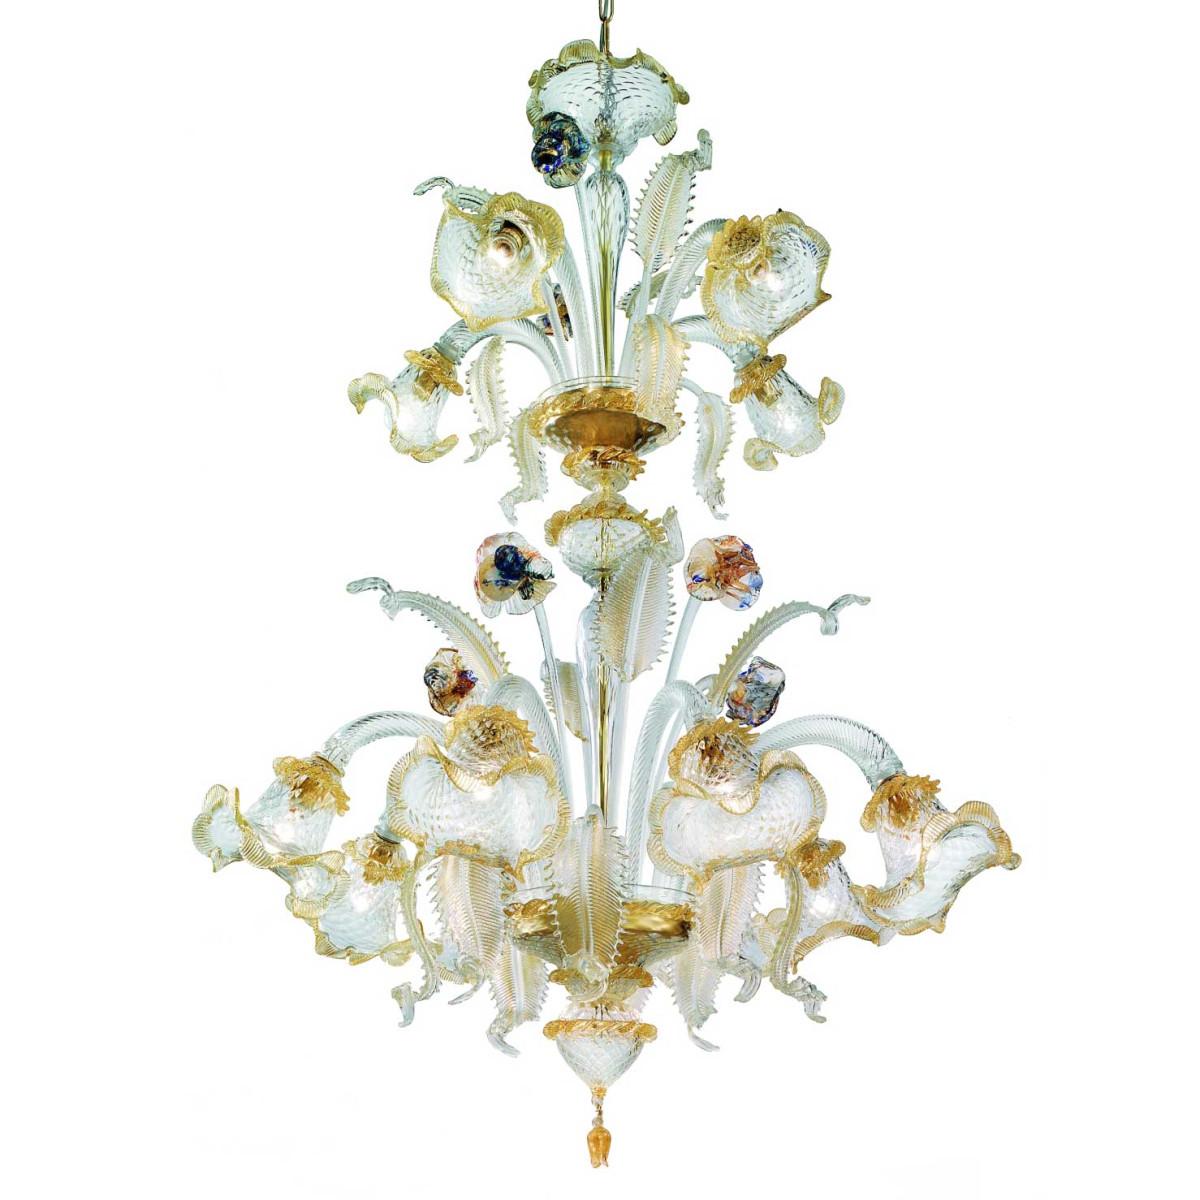 Canal Grande 2 niveles 8 +4 luces Murano lámpara de oro transparente - flores policromo